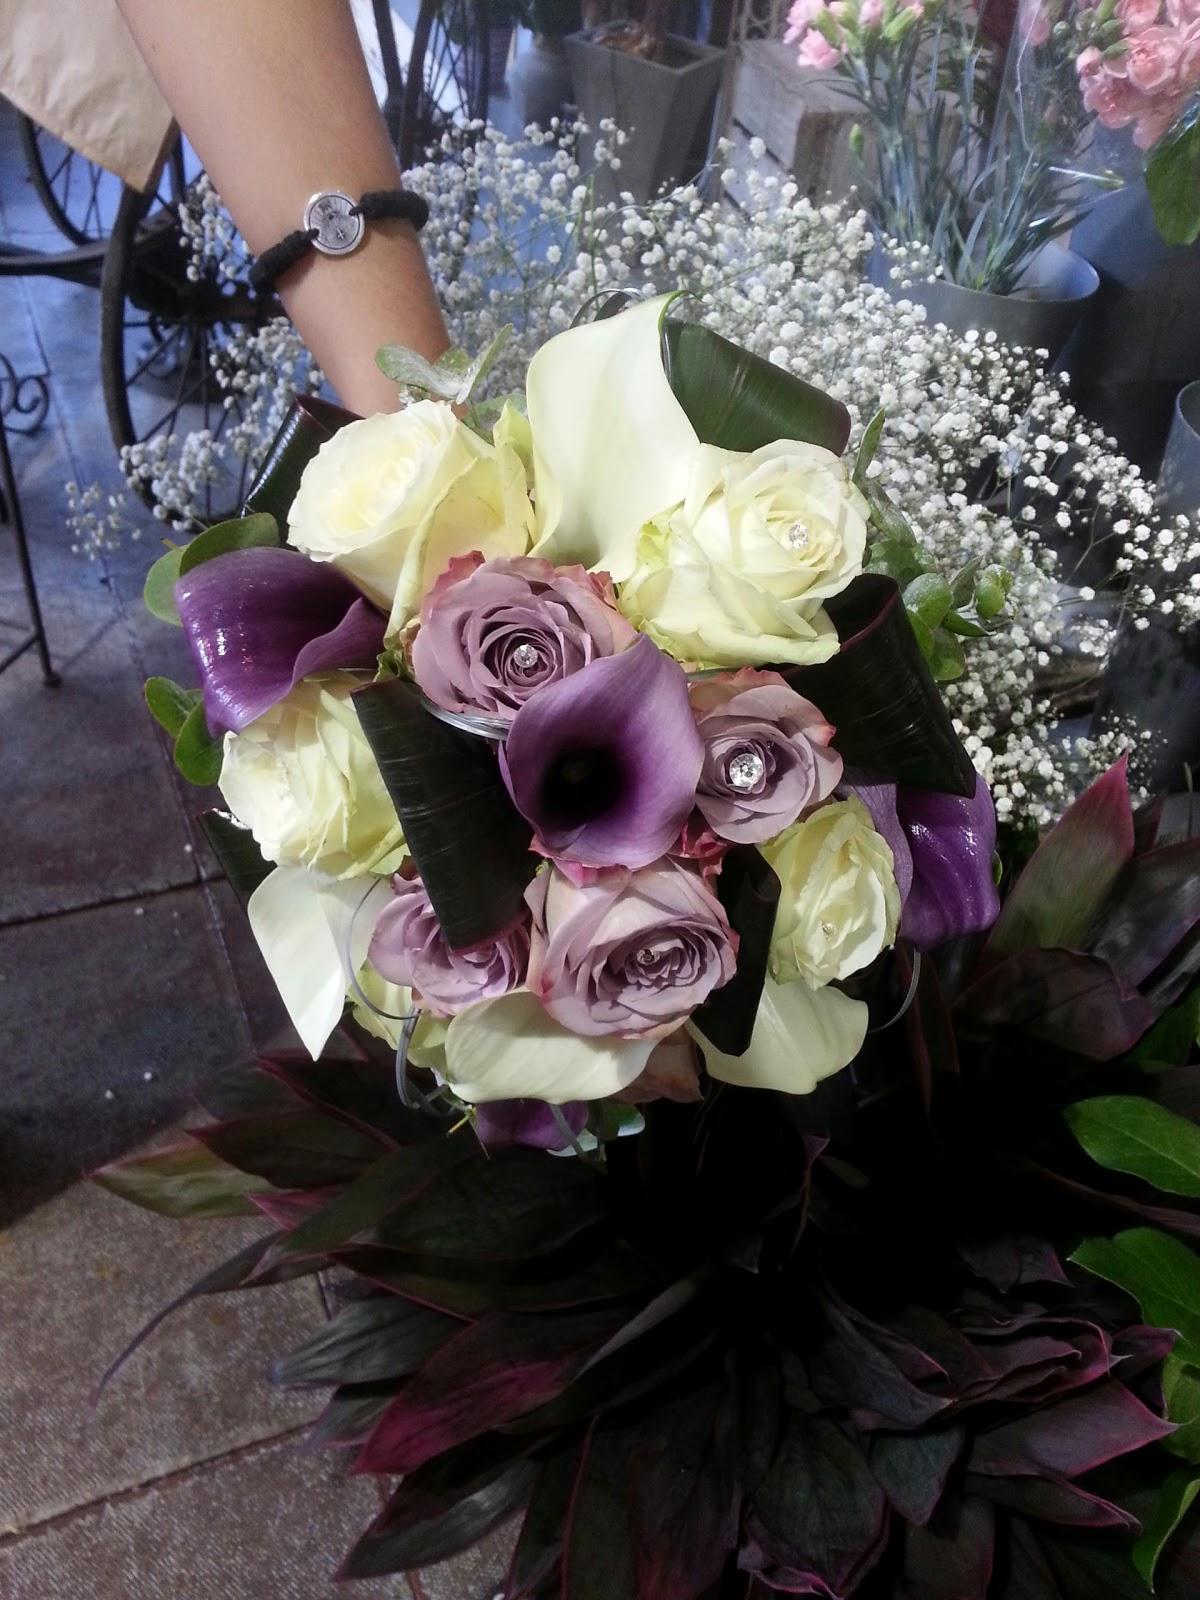 Silk wedding flowers leicestershire : Tippetts florist flowers oadby